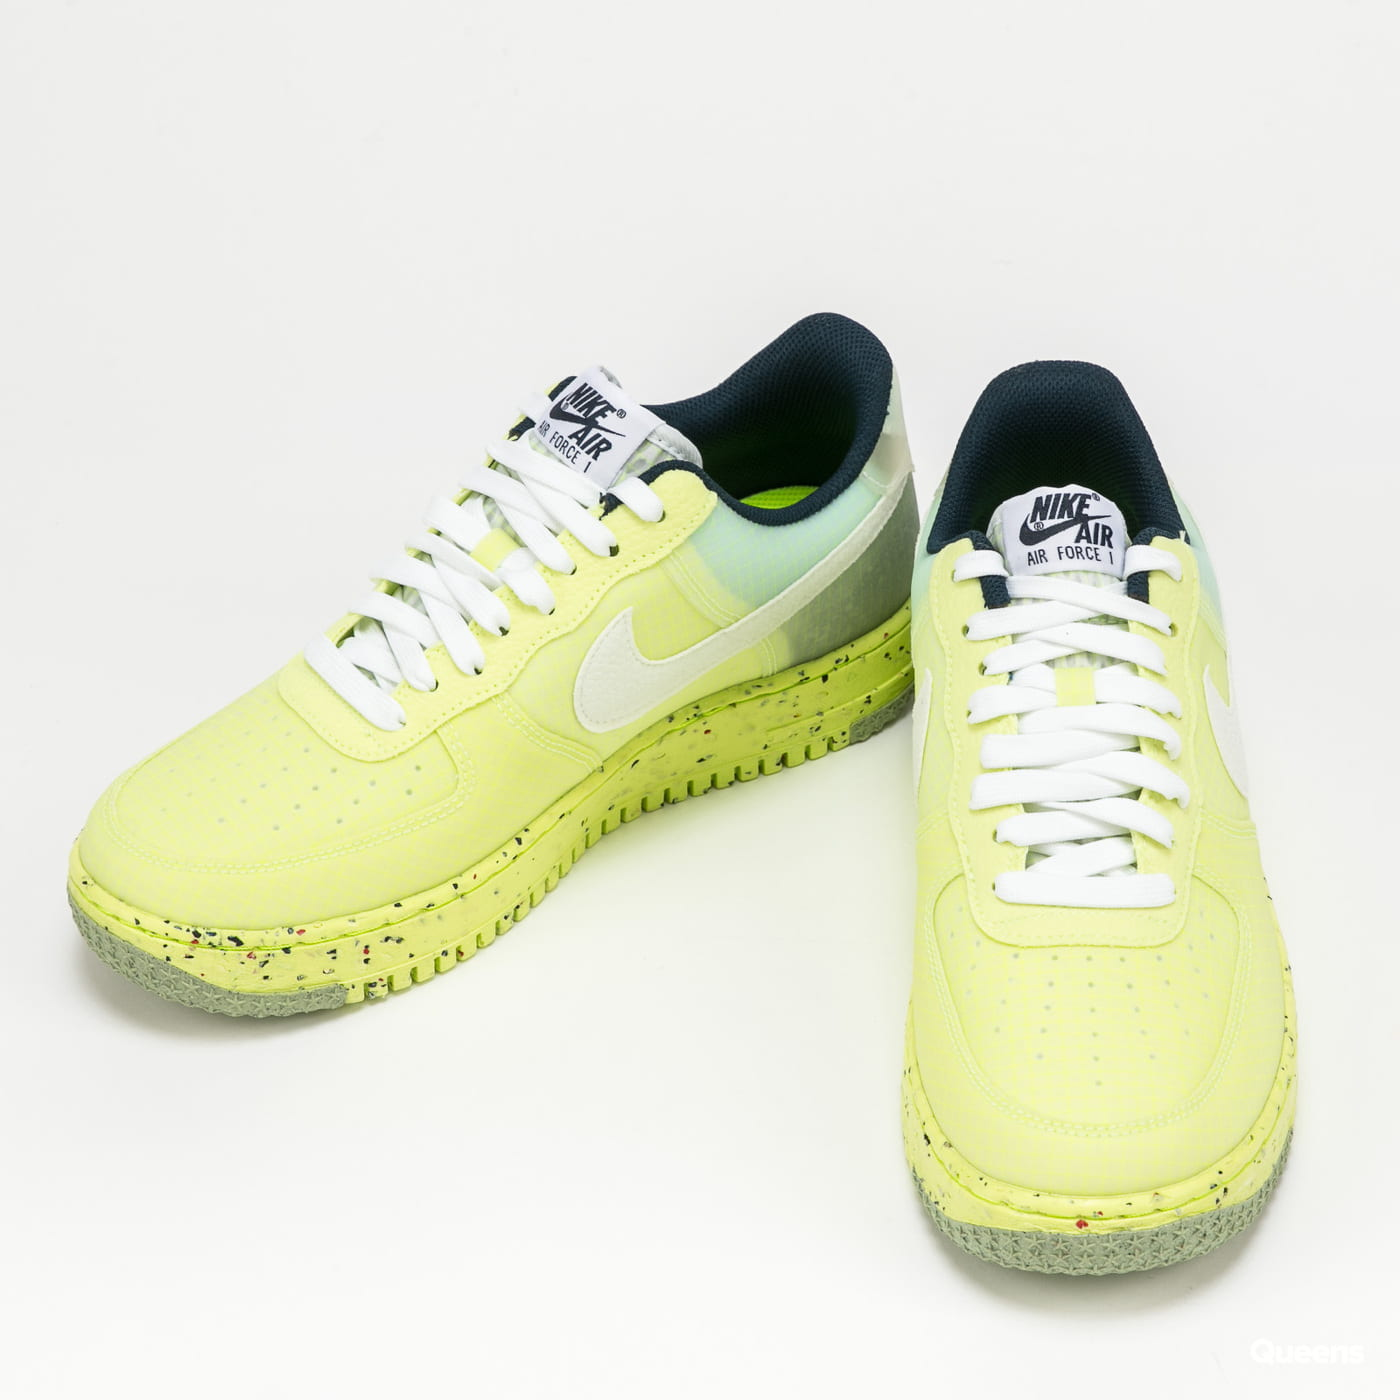 Nike Air Force 1 Crater lt lemon twist / white